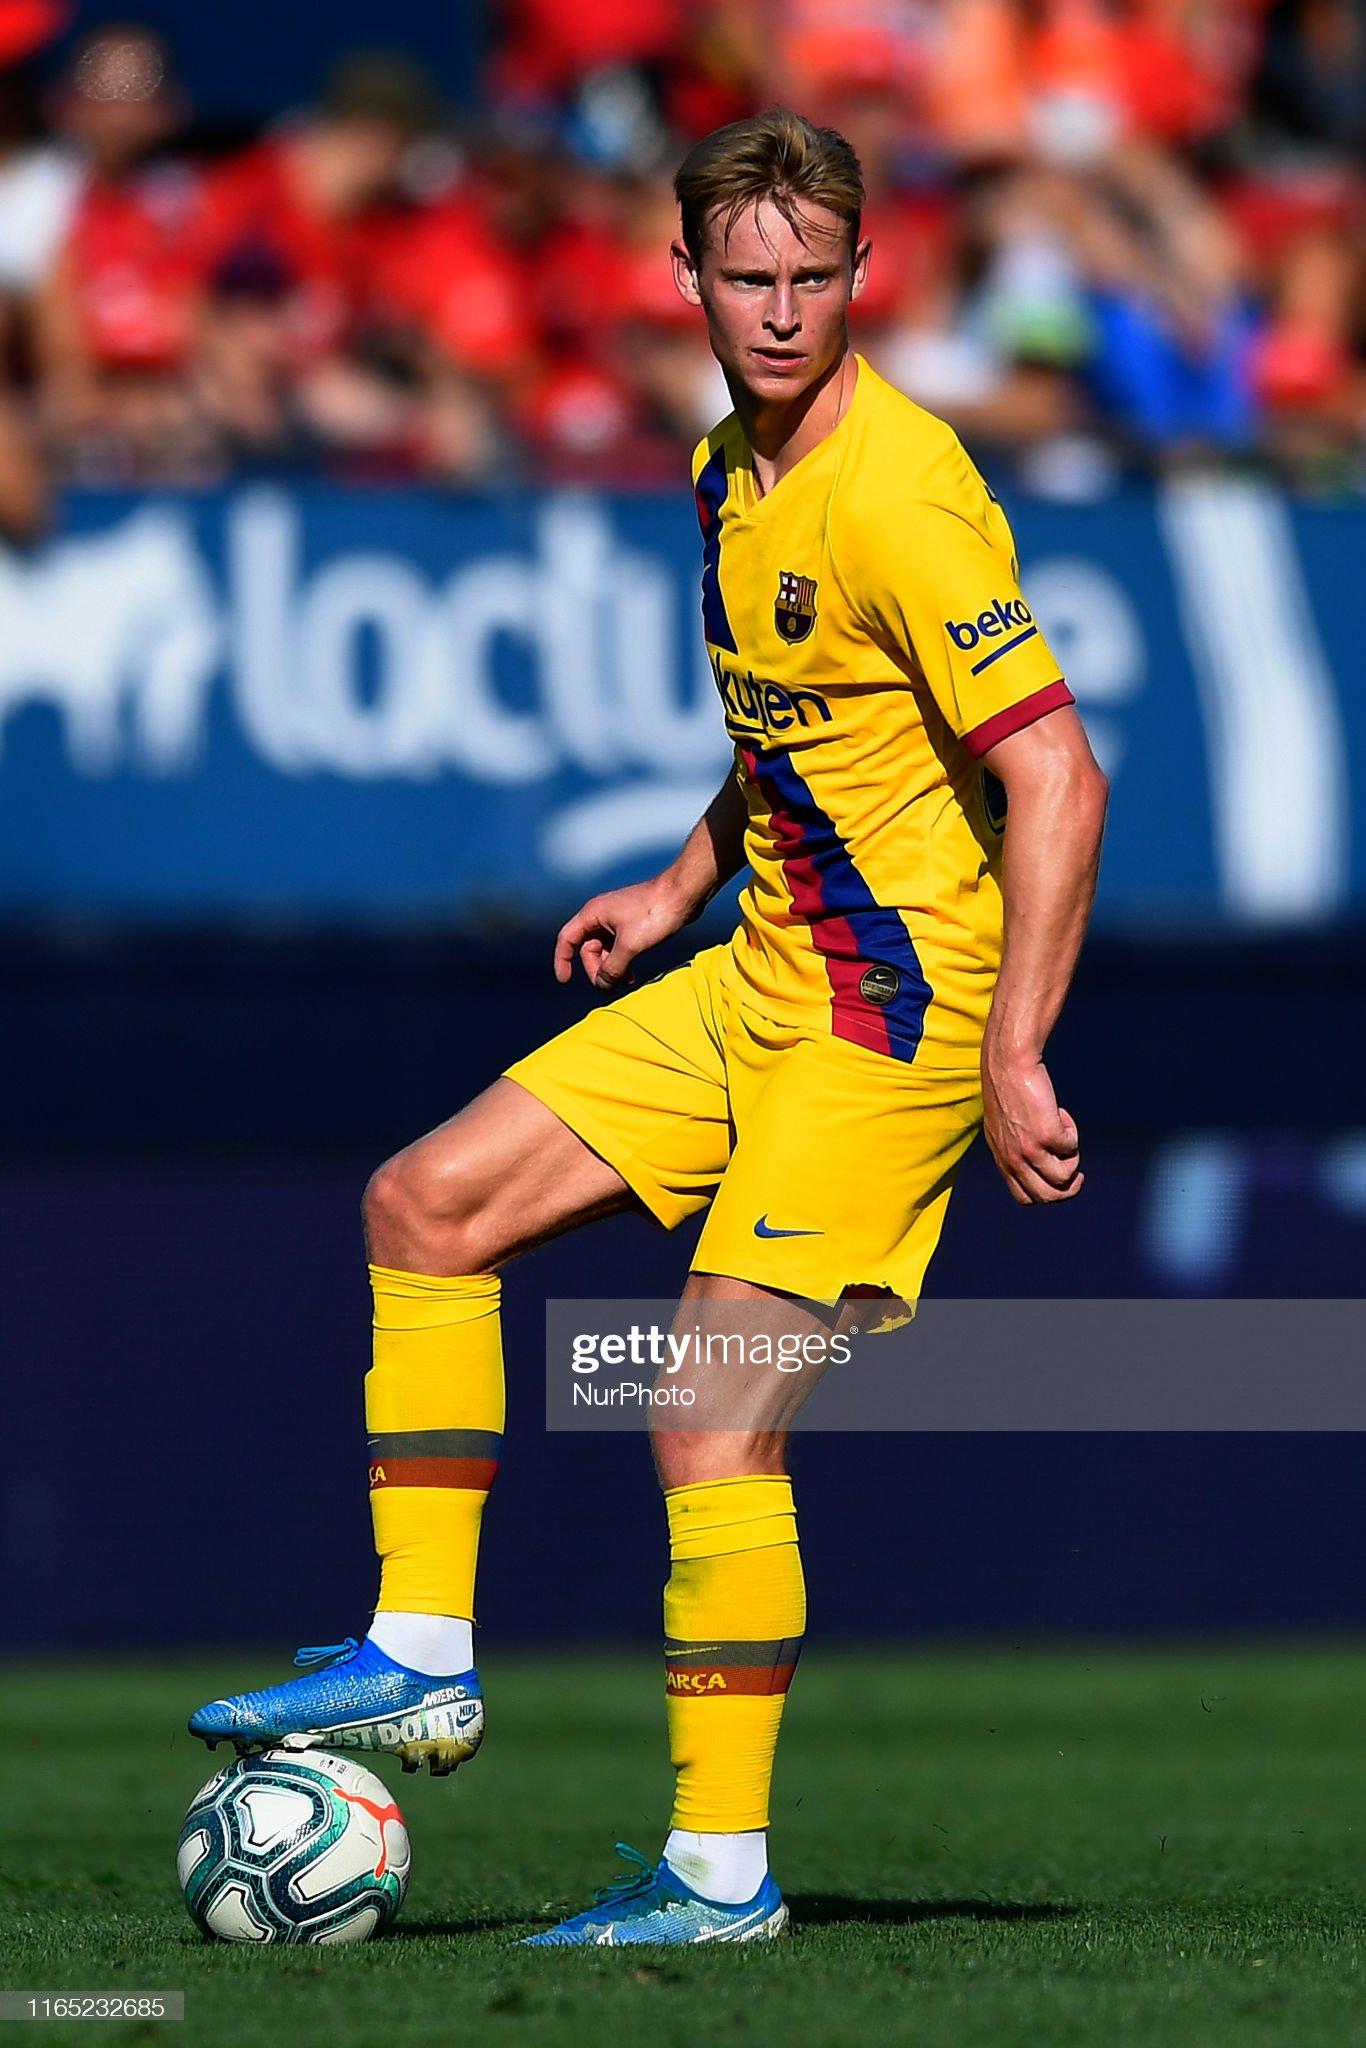 صور مباراة : أوساسونا - برشلونة 2-2 ( 31-08-2019 )  Frenkie-de-jong-of-barcelona-controls-the-ball-during-the-liga-match-picture-id1165232685?s=2048x2048